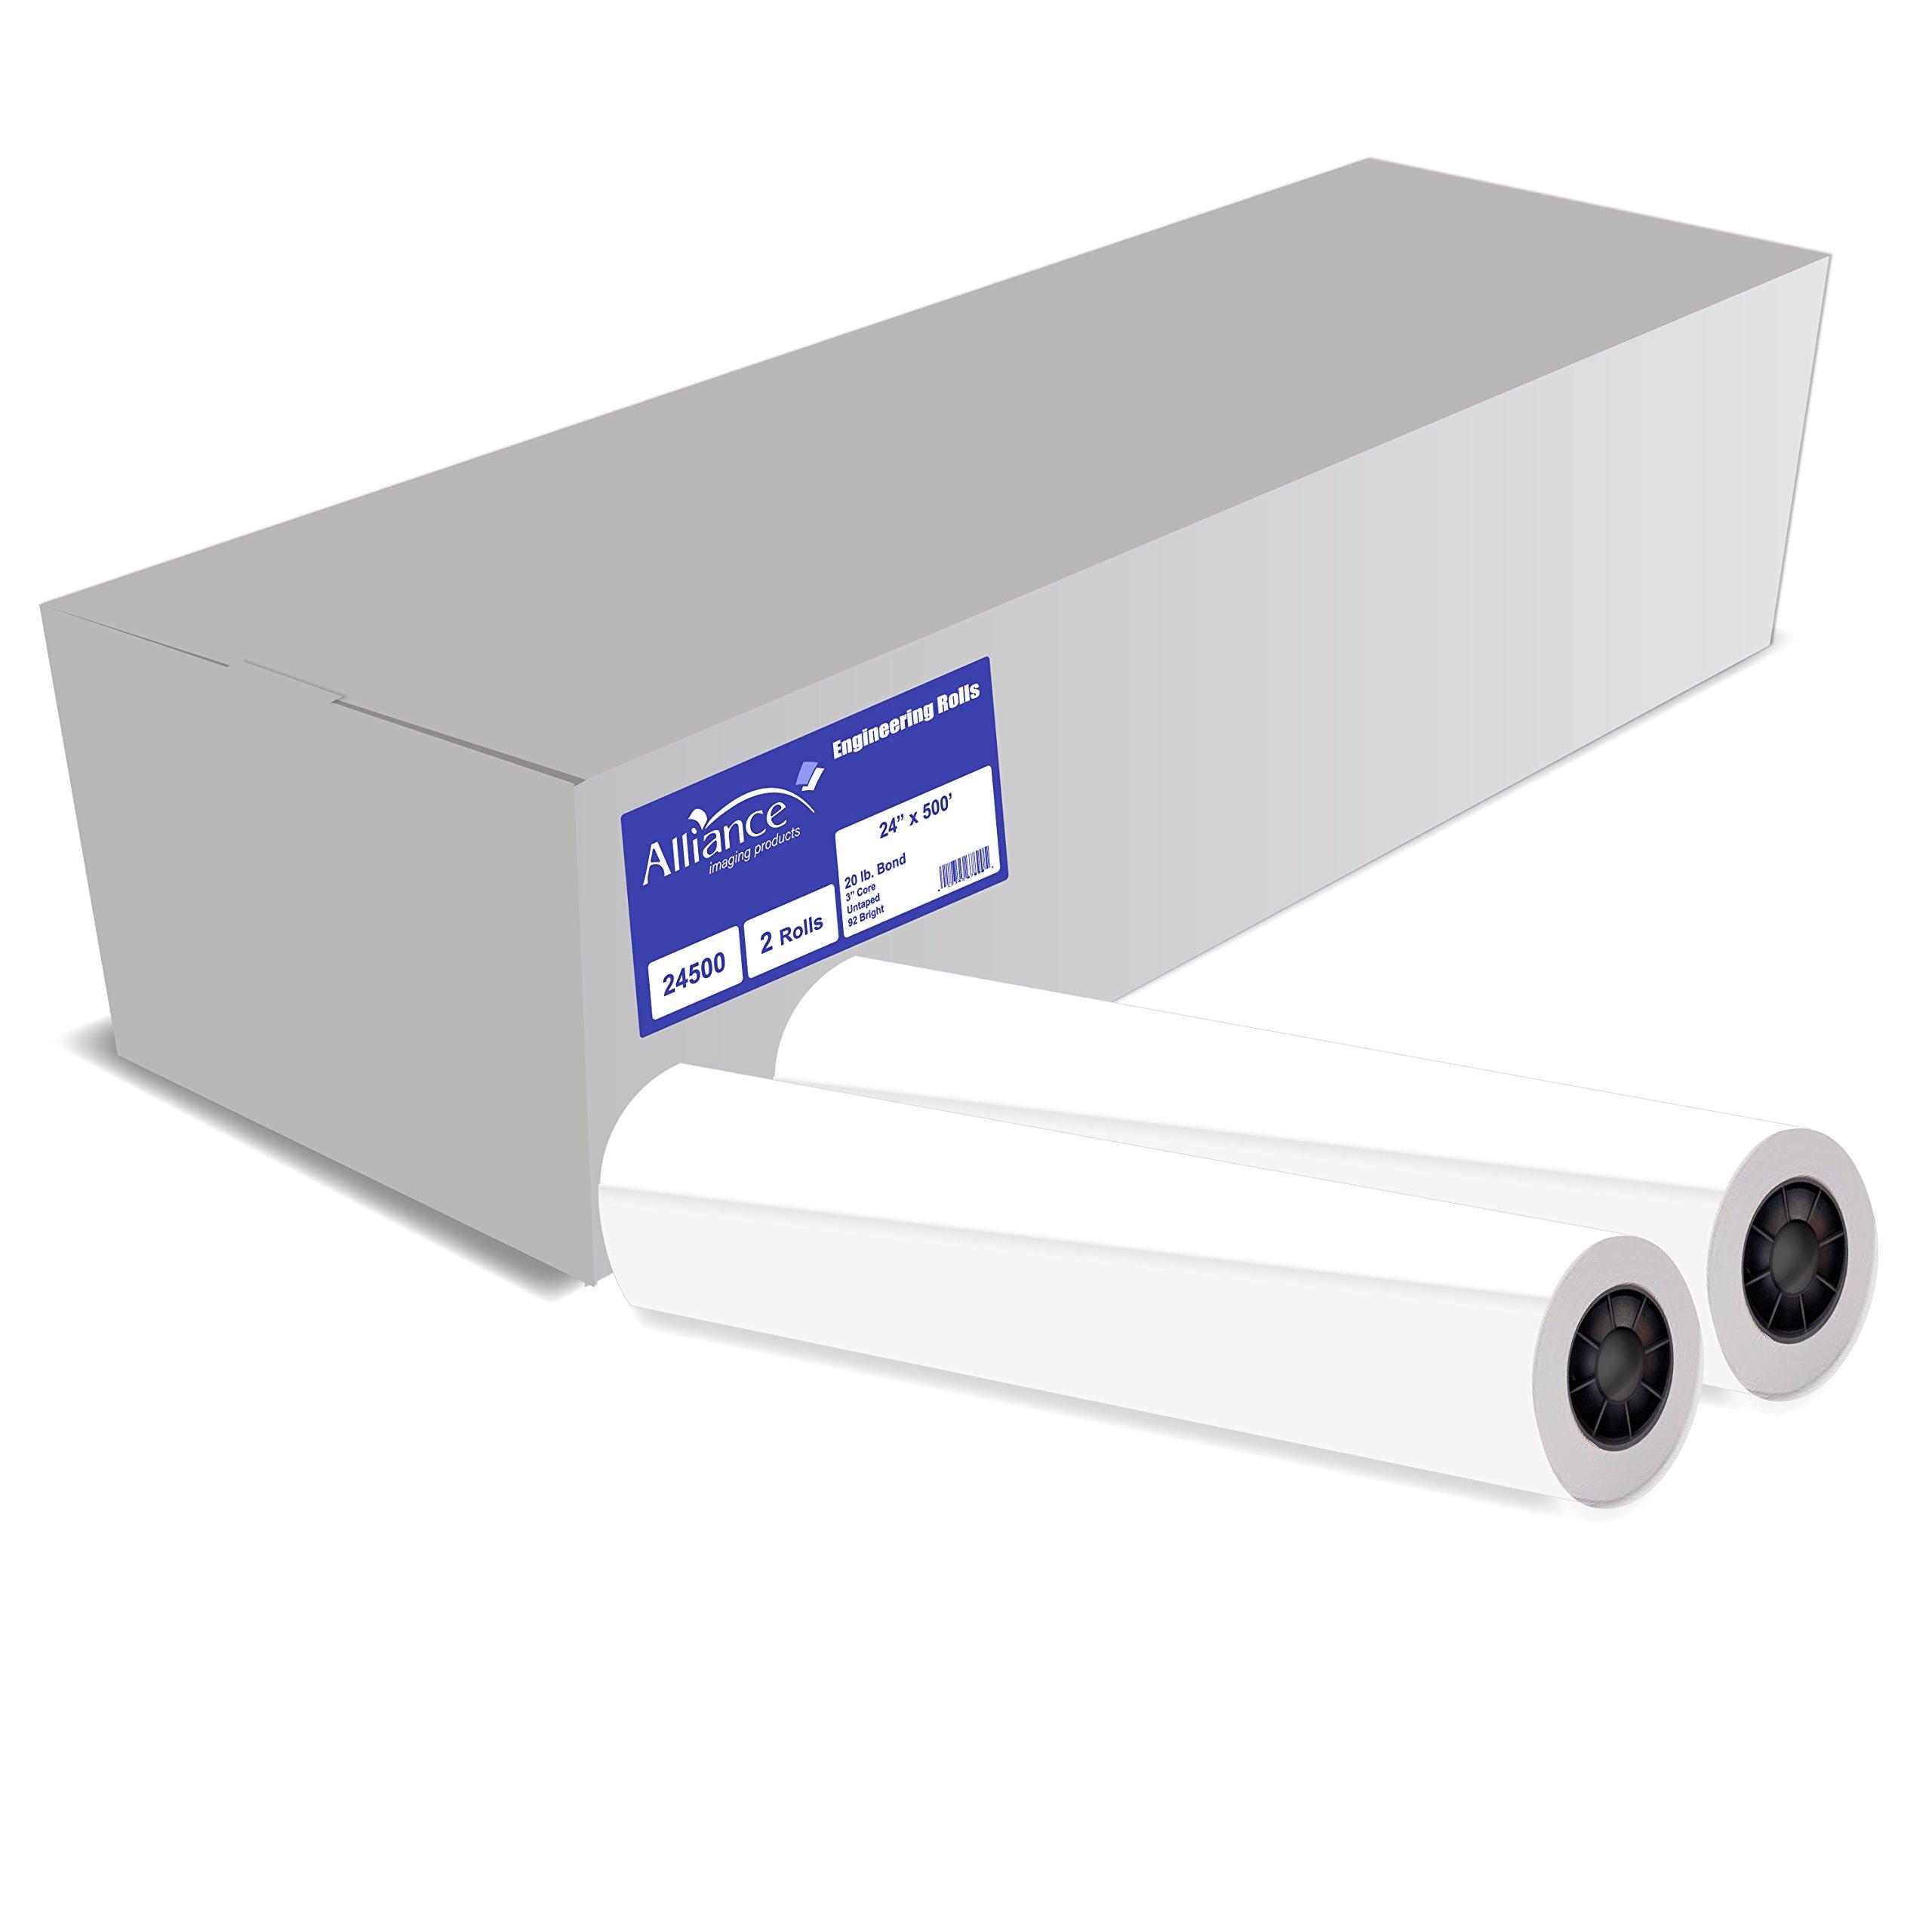 Alliance Untaped CAD Paper Rolls, 24'' x 500', 92 Bright, Ink Jet Bond, Engineering - 2 Rolls Per Carton, 3 Inch Core